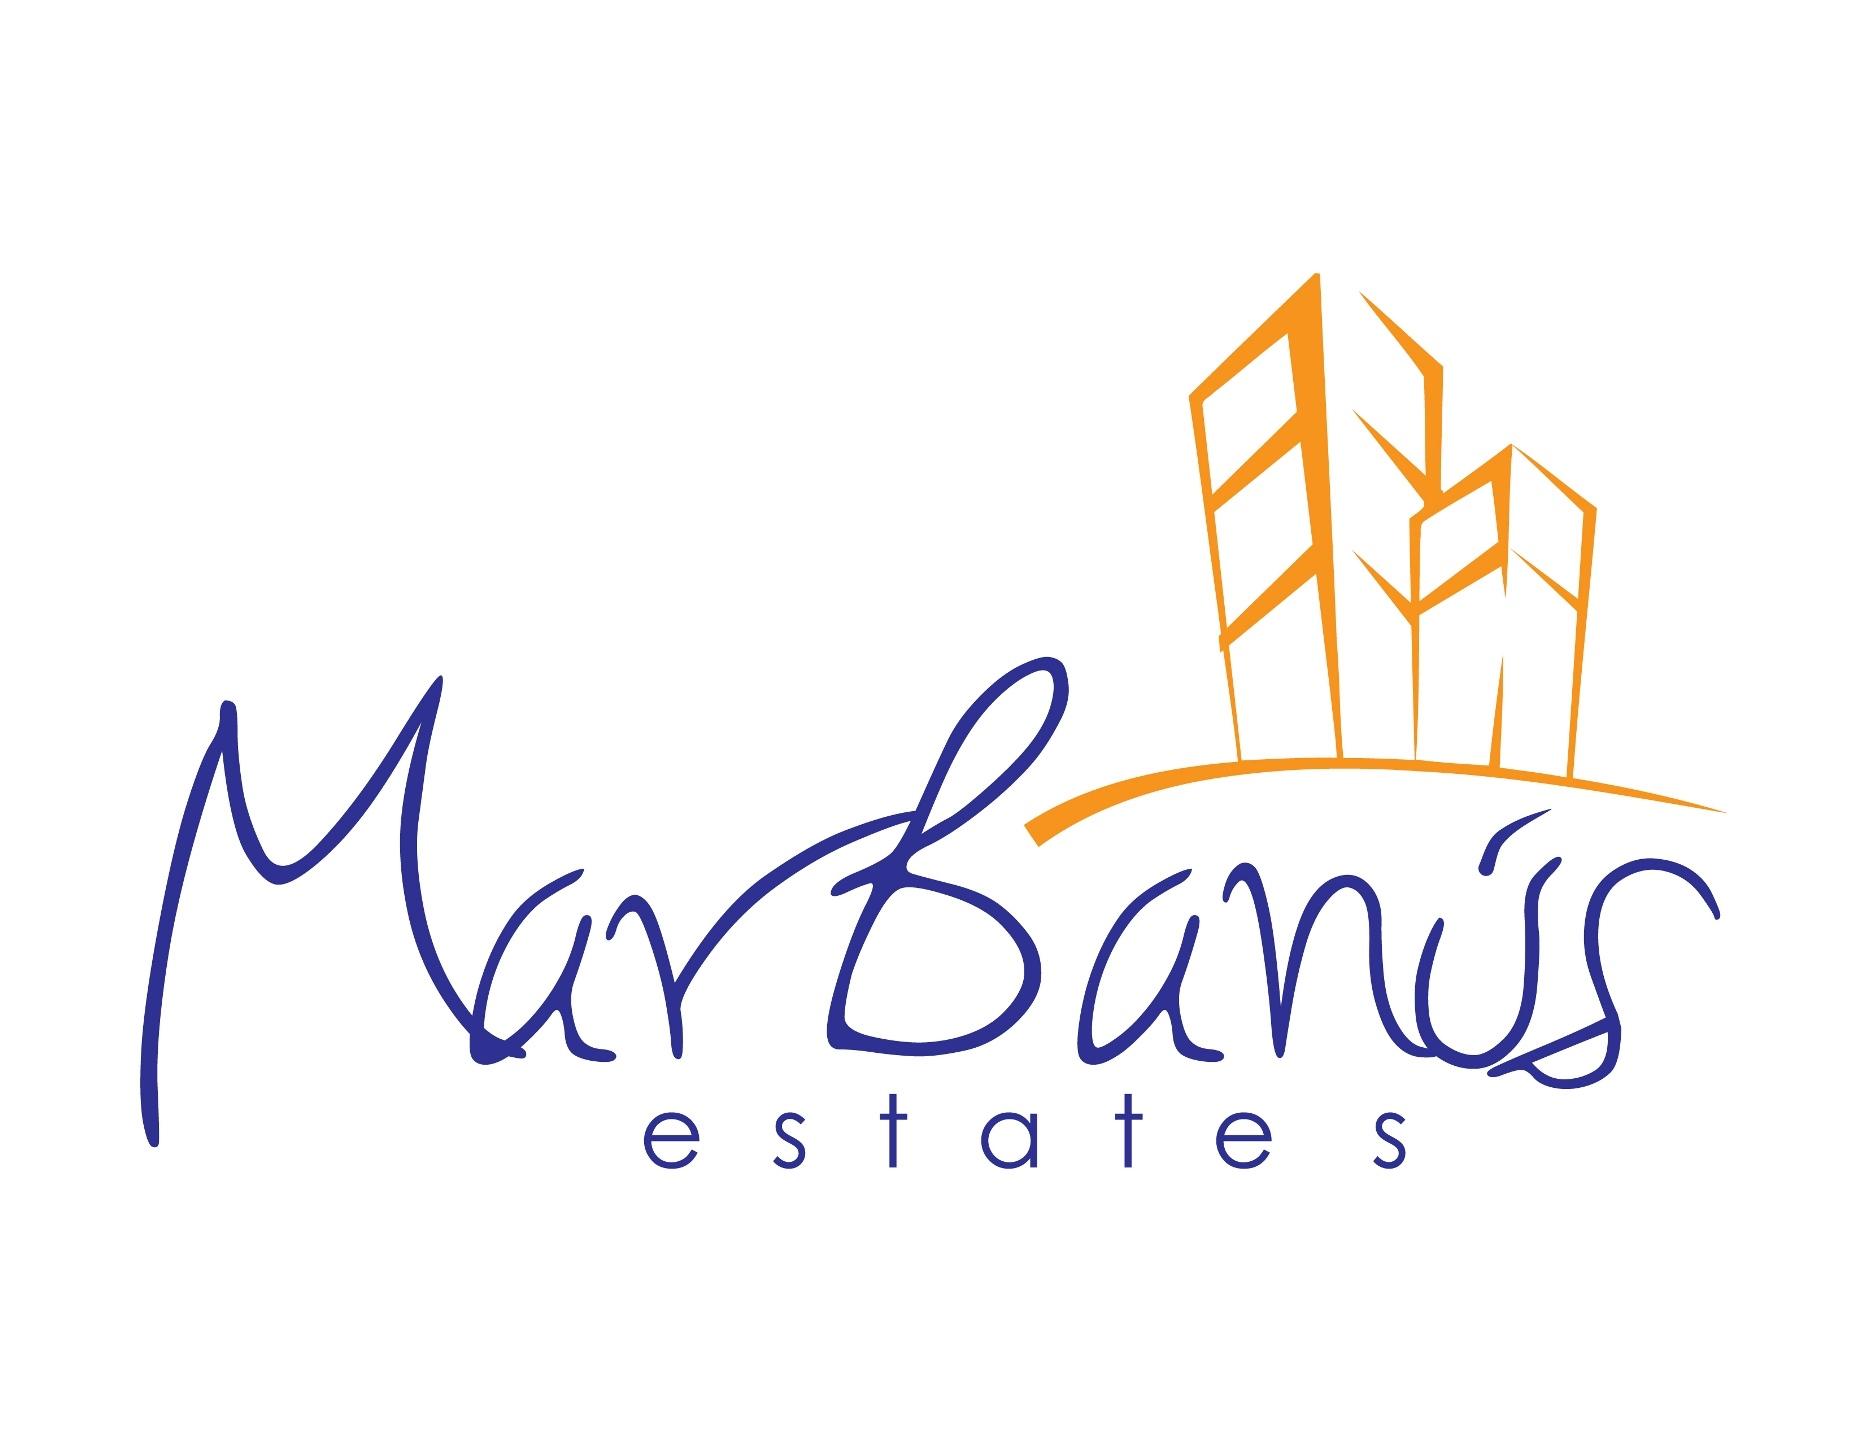 MARBANUS ESTATES logo